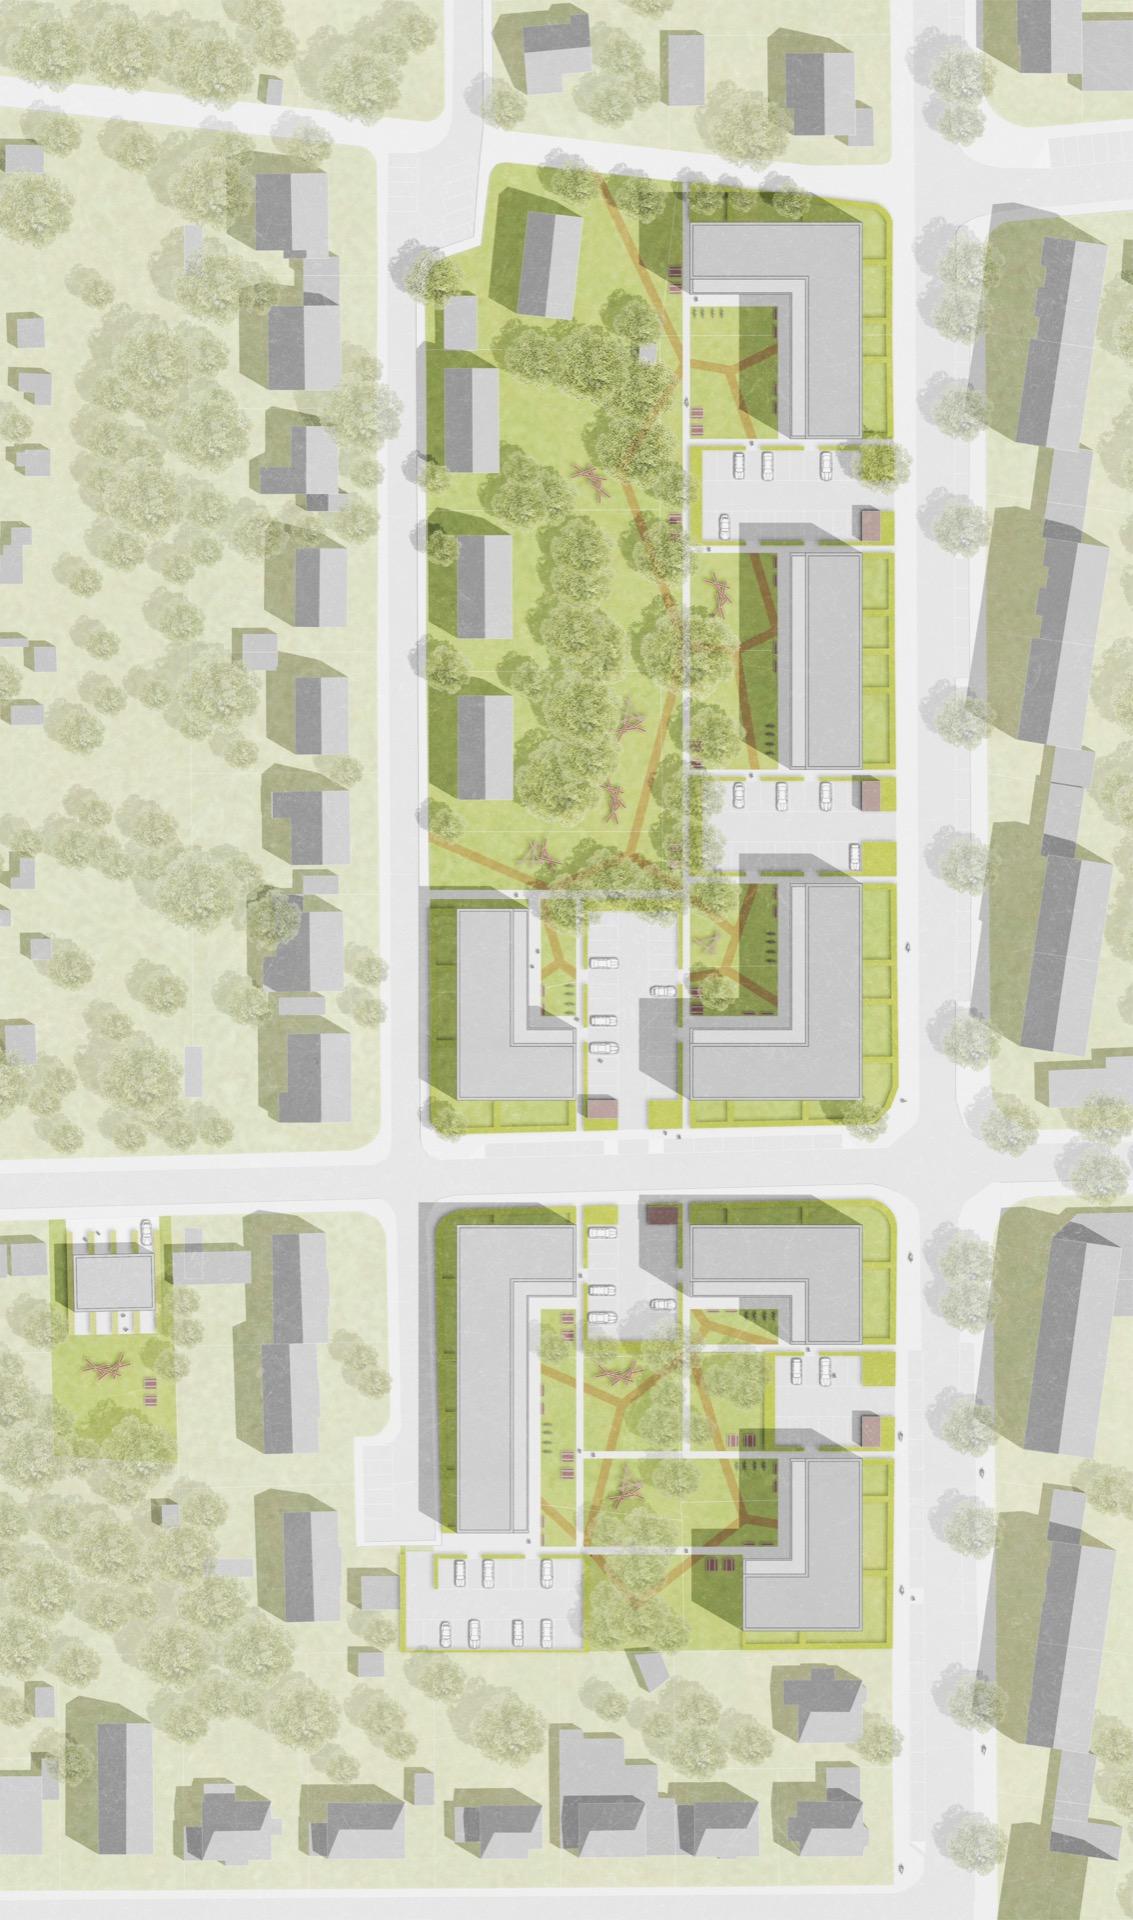 Lageplan © Architekten BDA Feldschnieders + Kister